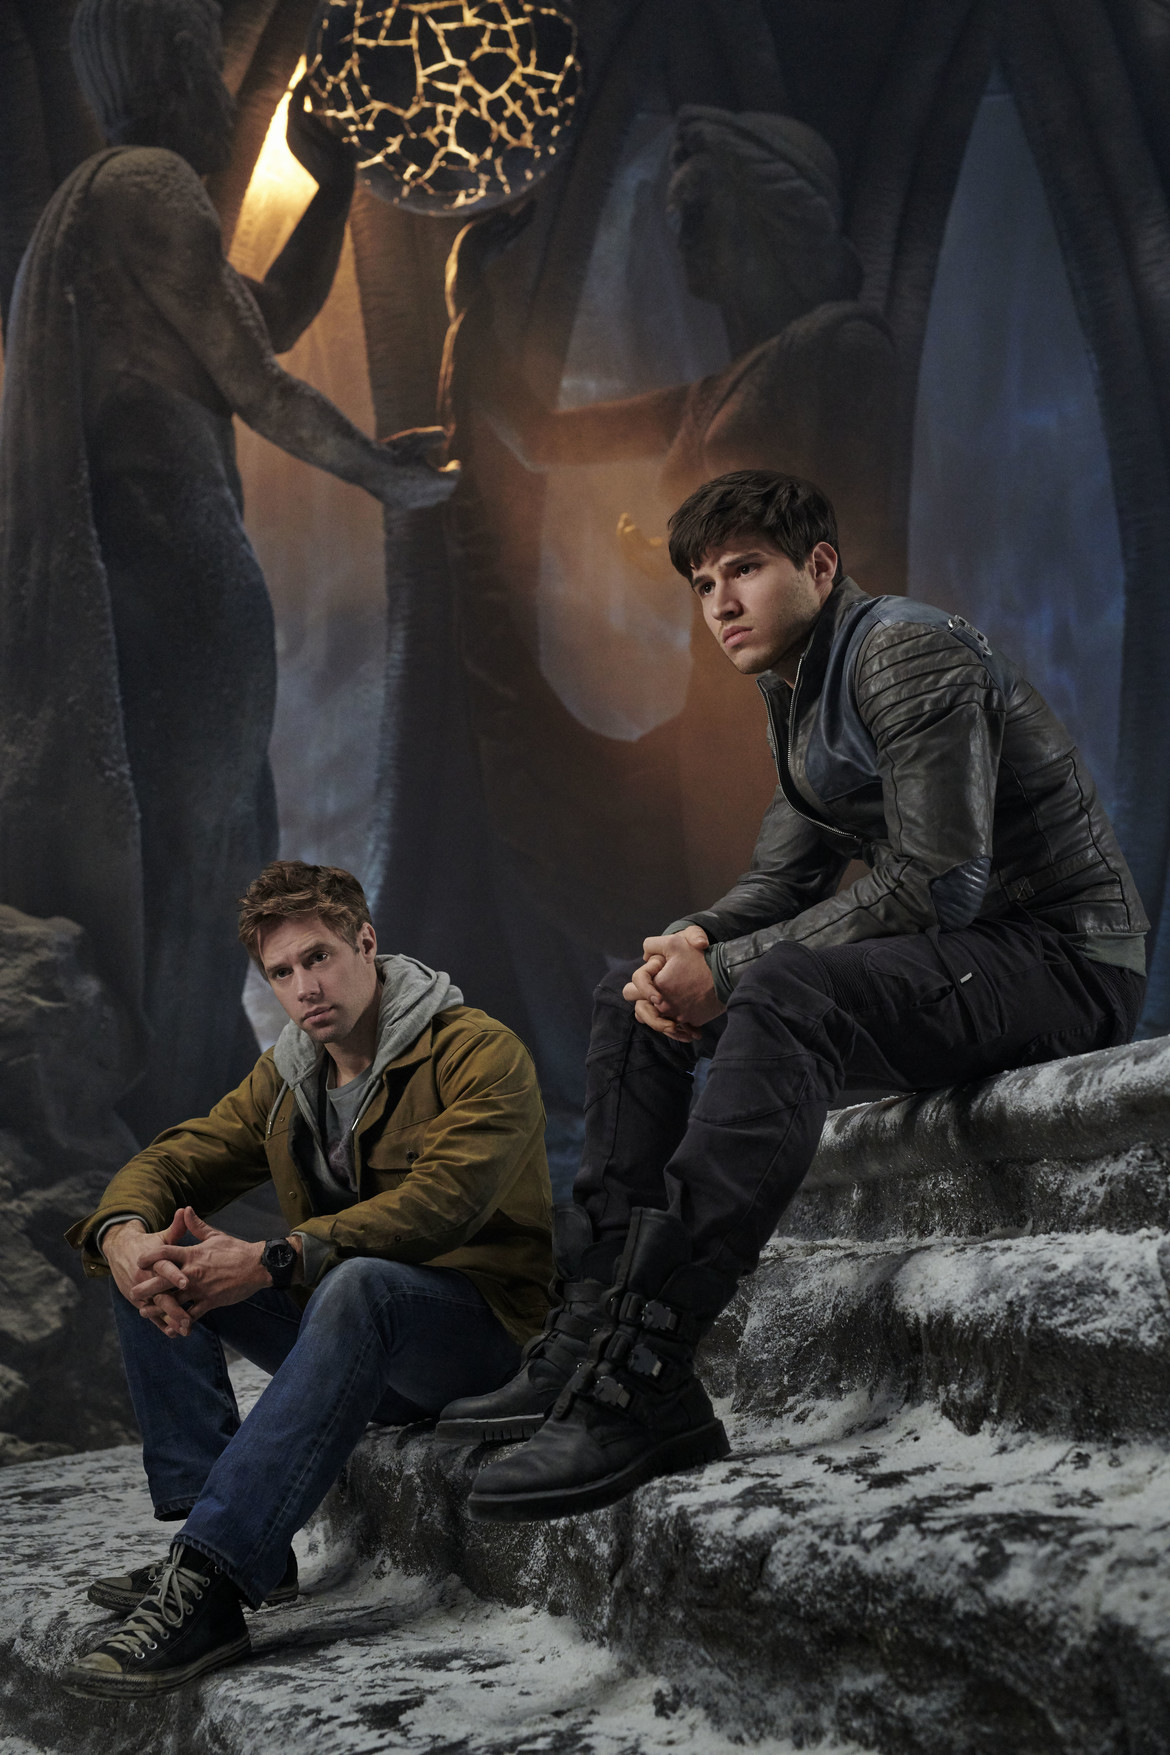 Krypton, Seg and Adam